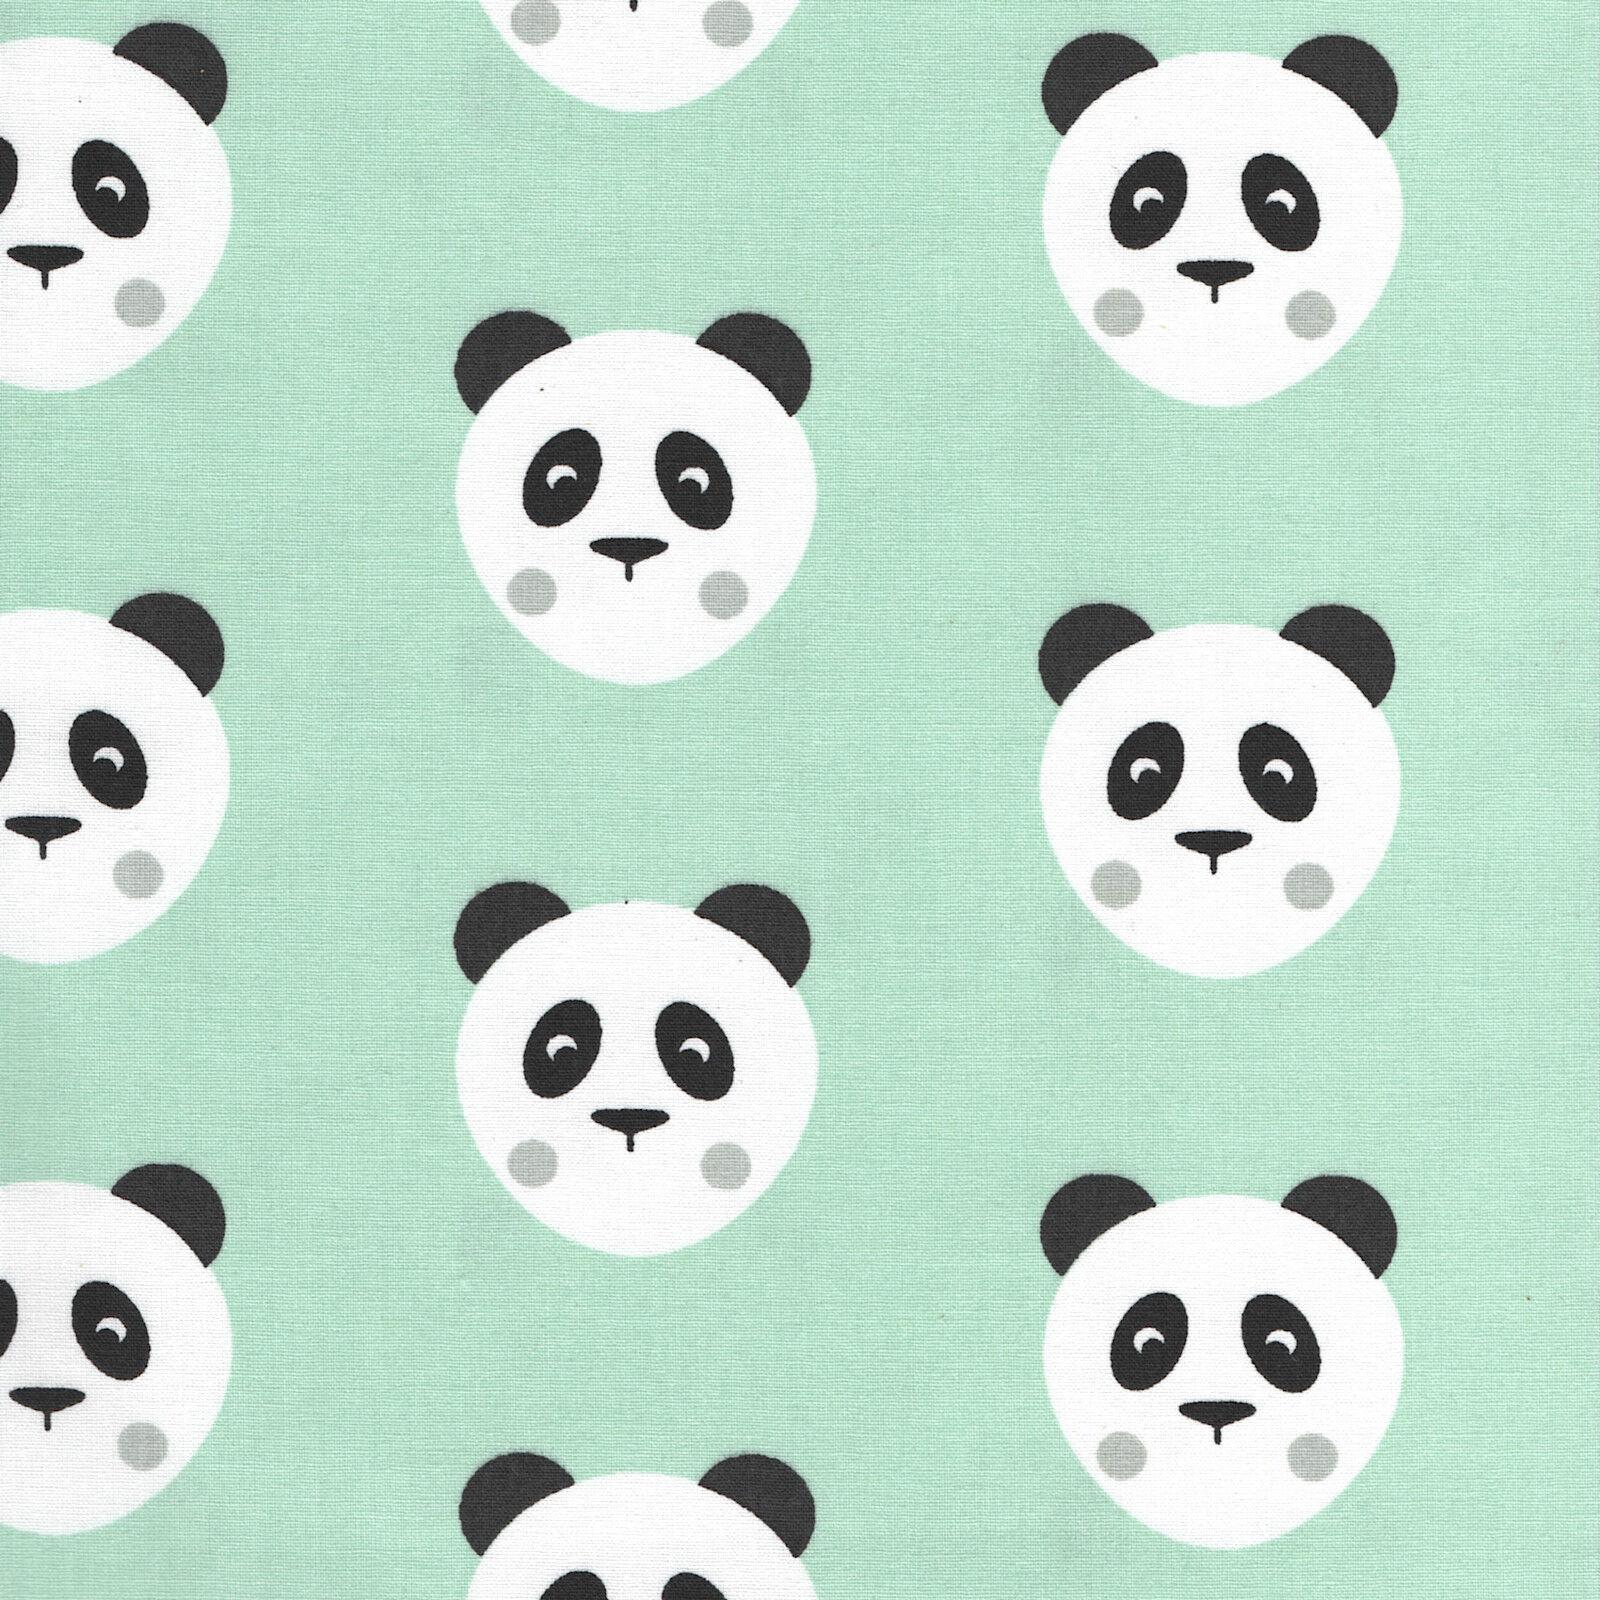 Bundle of Two Fat Quarters of Fabric Panda Pandas Theme Cotton /& Polycotton